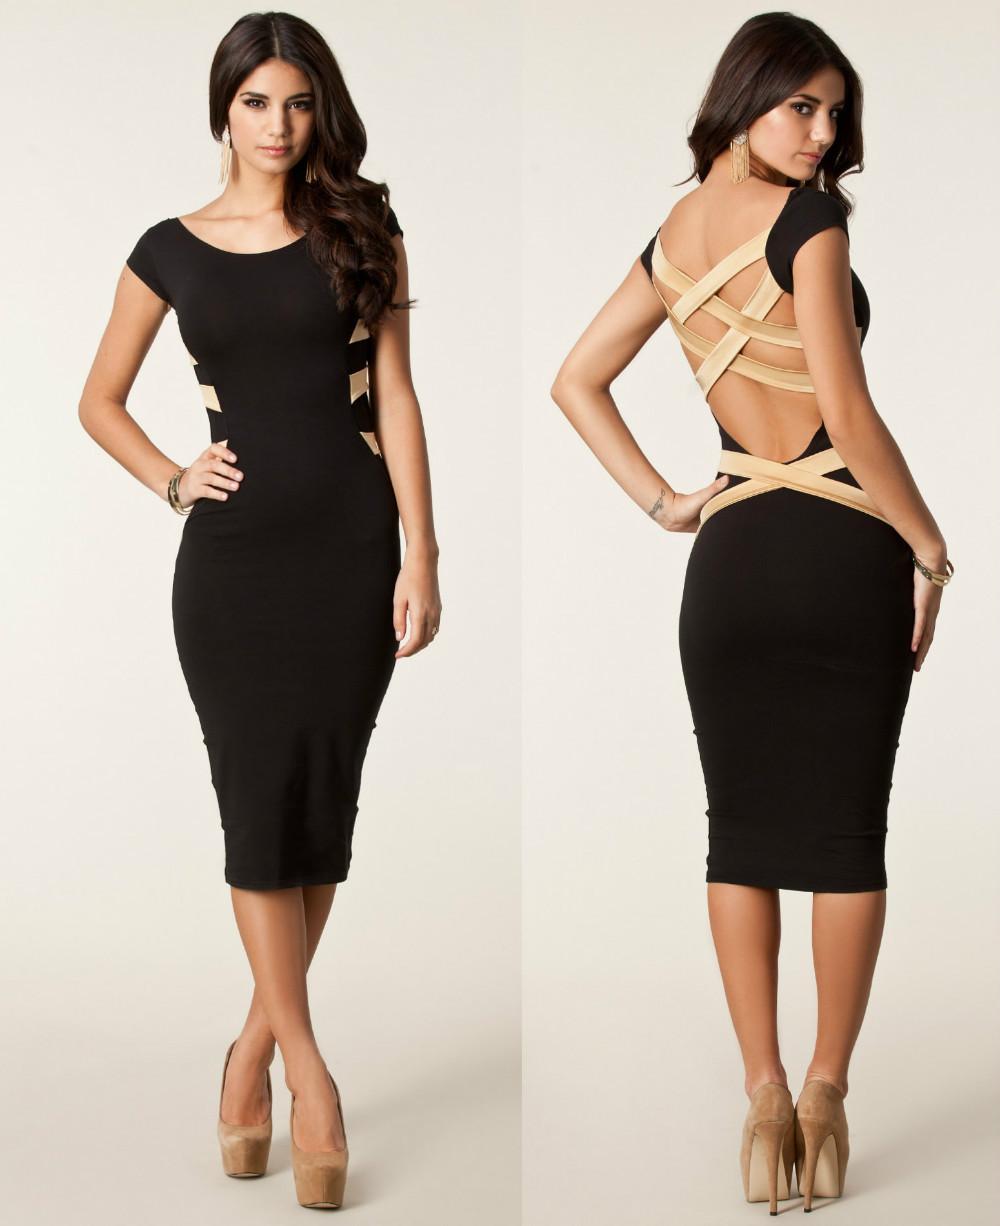 NO2 Women Dresses 2015 New Fashion Black Sexy Off Shoulder Dresses ...